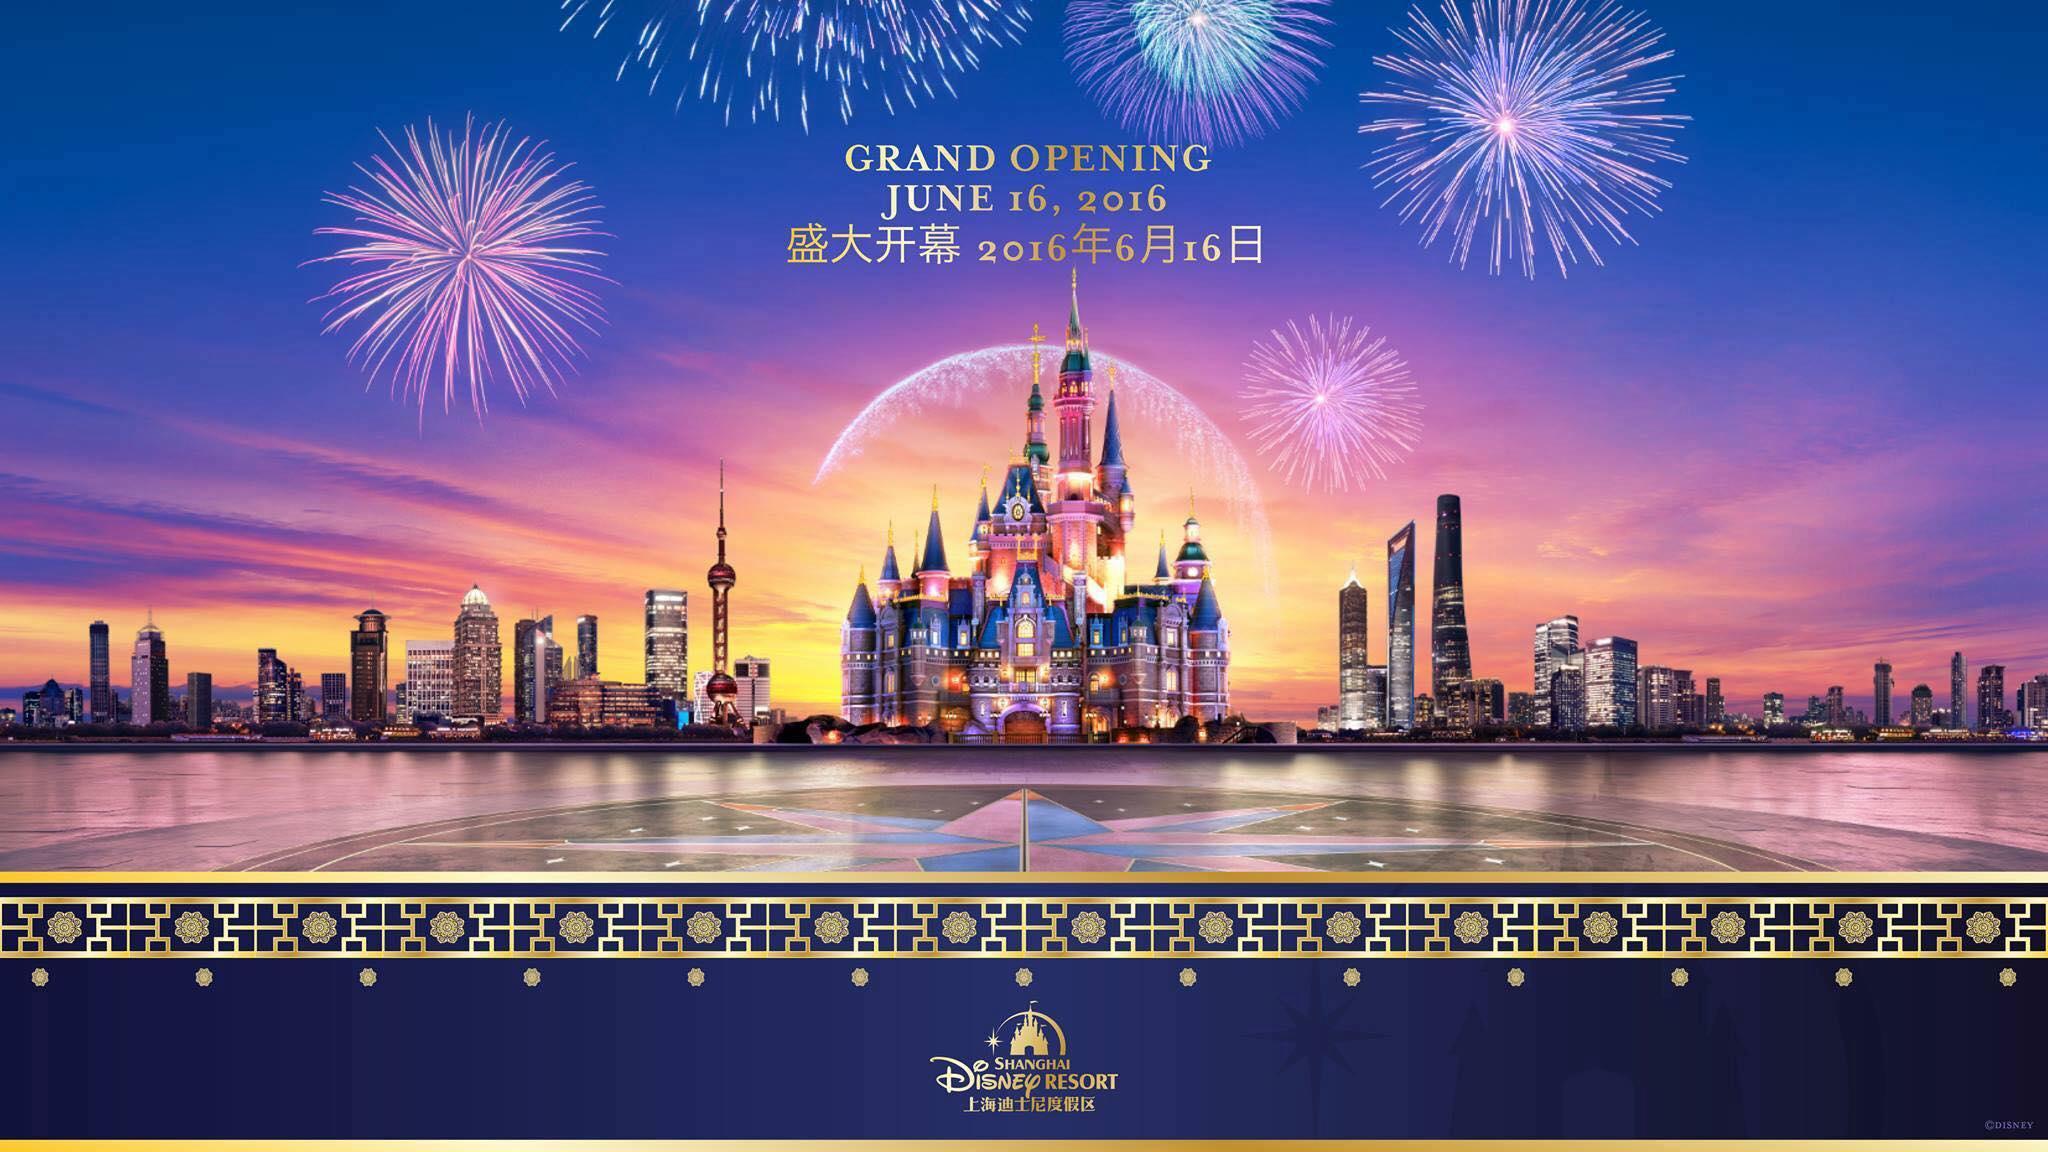 shanghai disneyland opening 2016